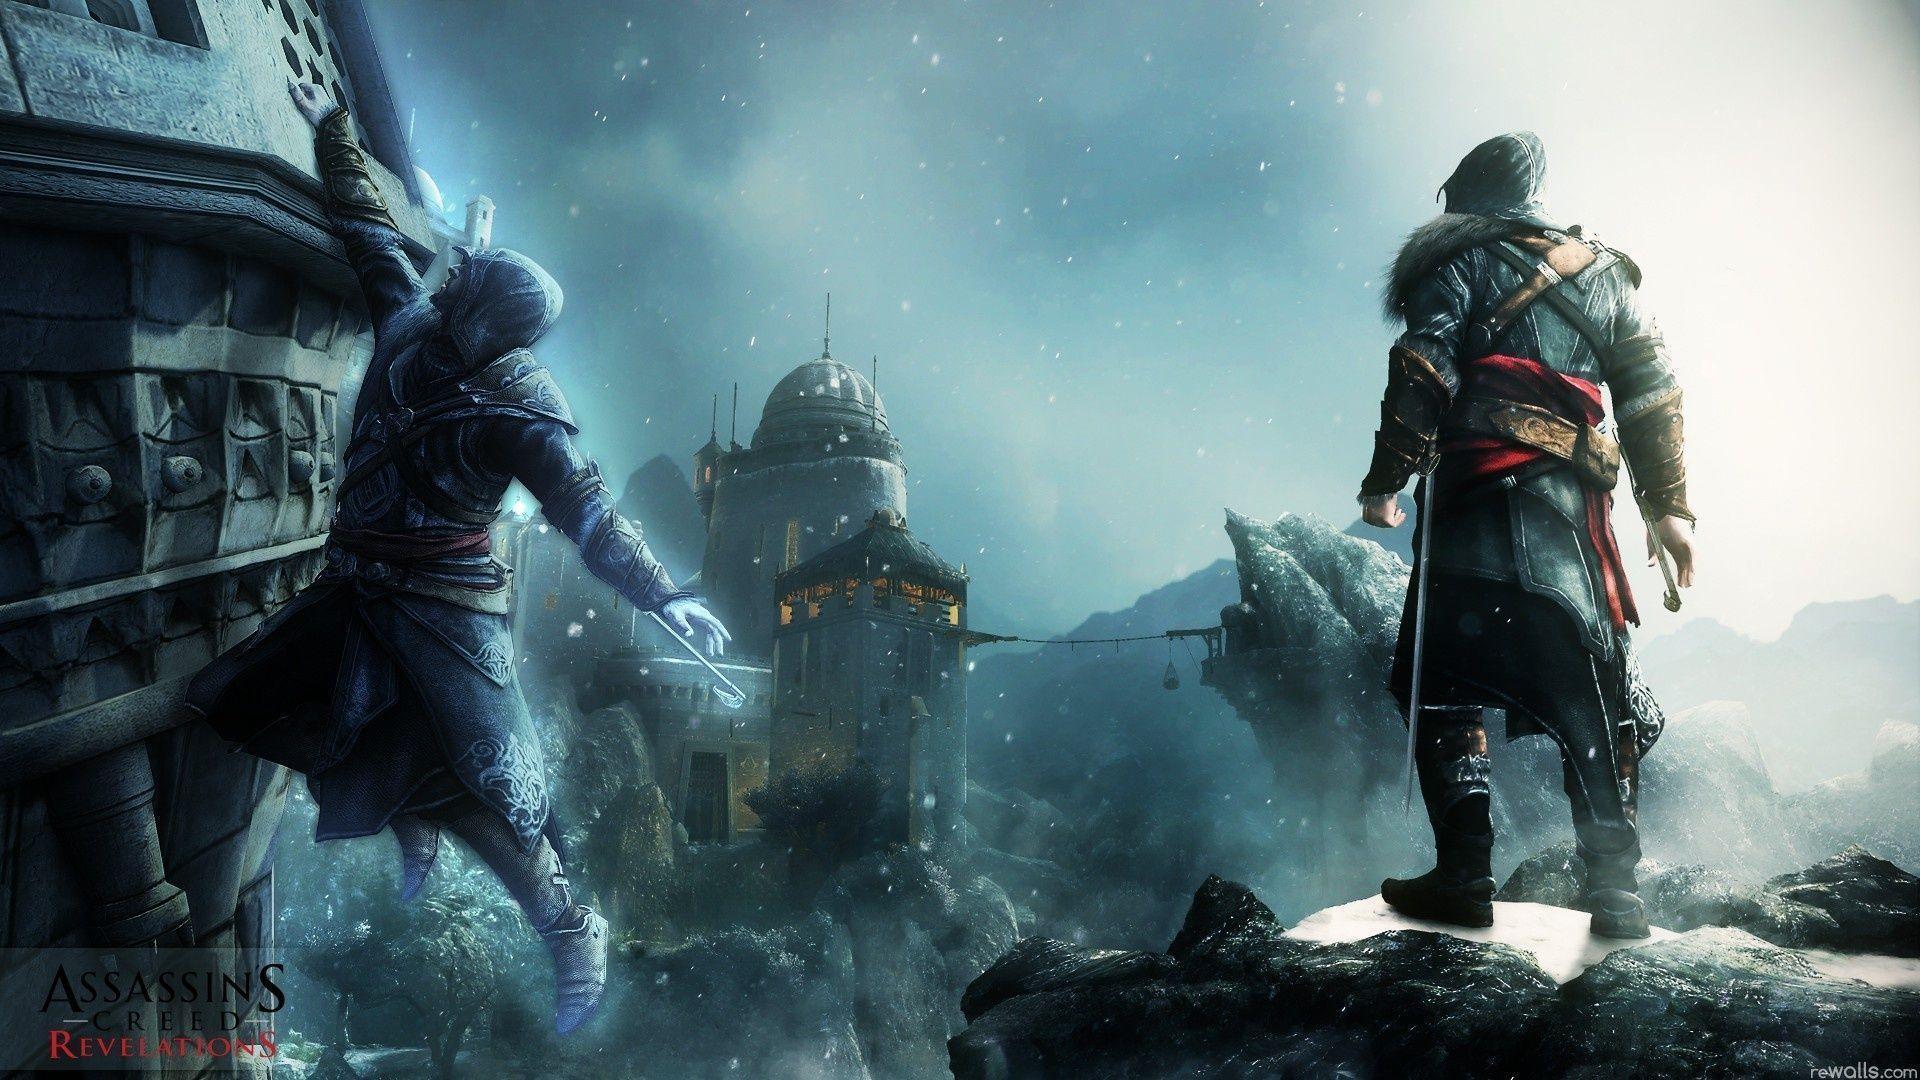 Assassin's Creed Desktop Backgrounds